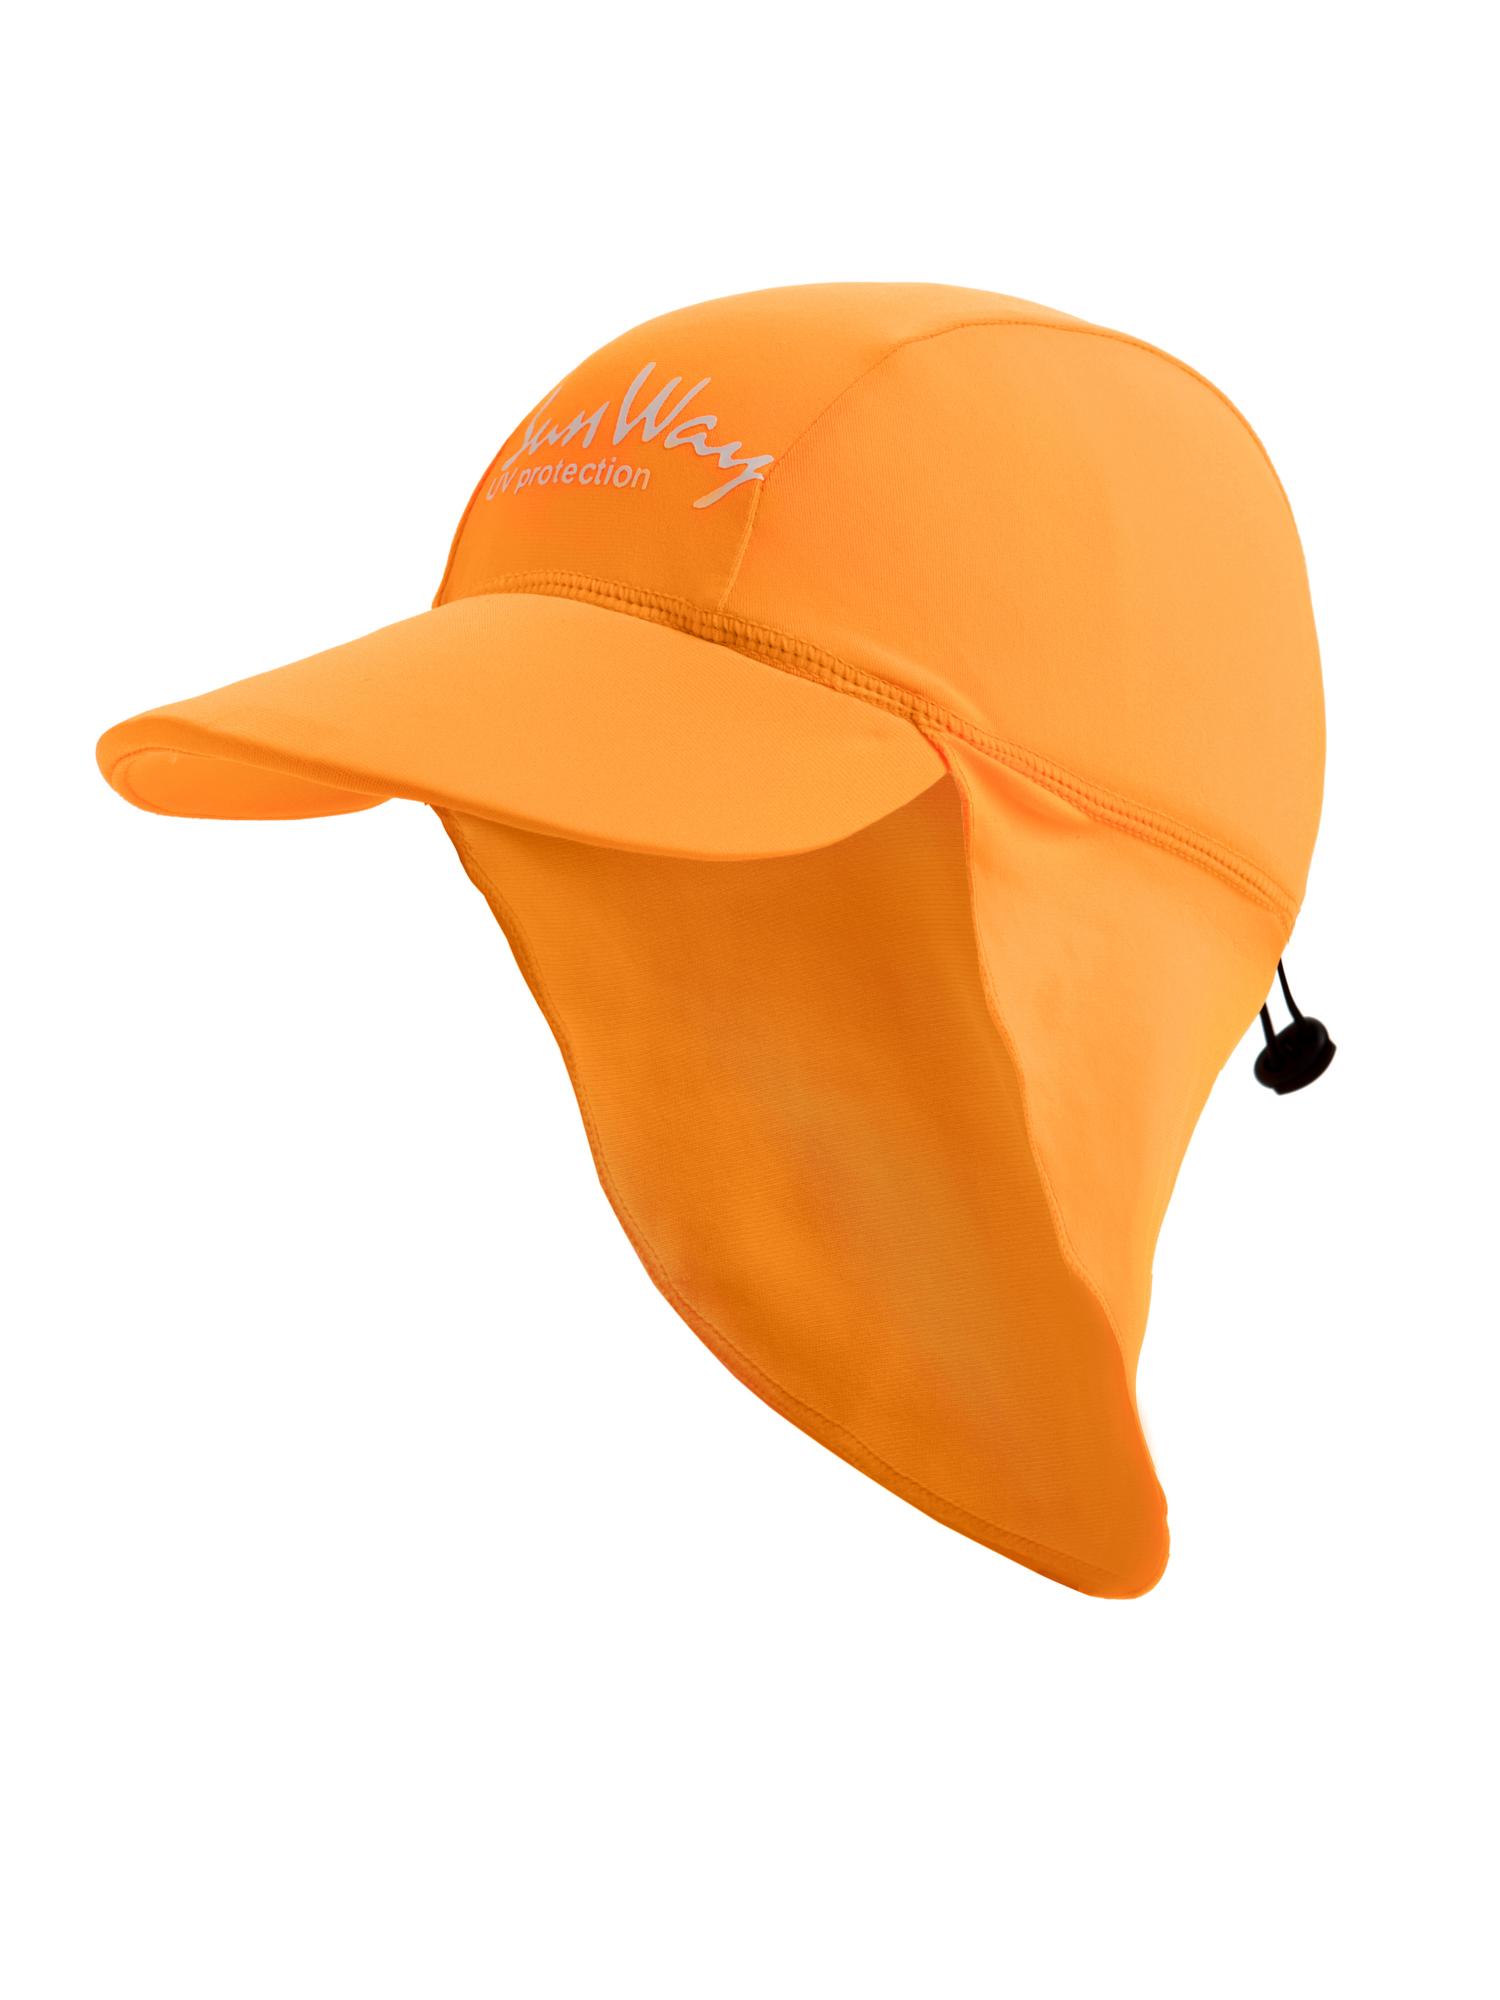 SunWay s UV Protective Hats  Orange Legionnaire Hat f6259e0cded